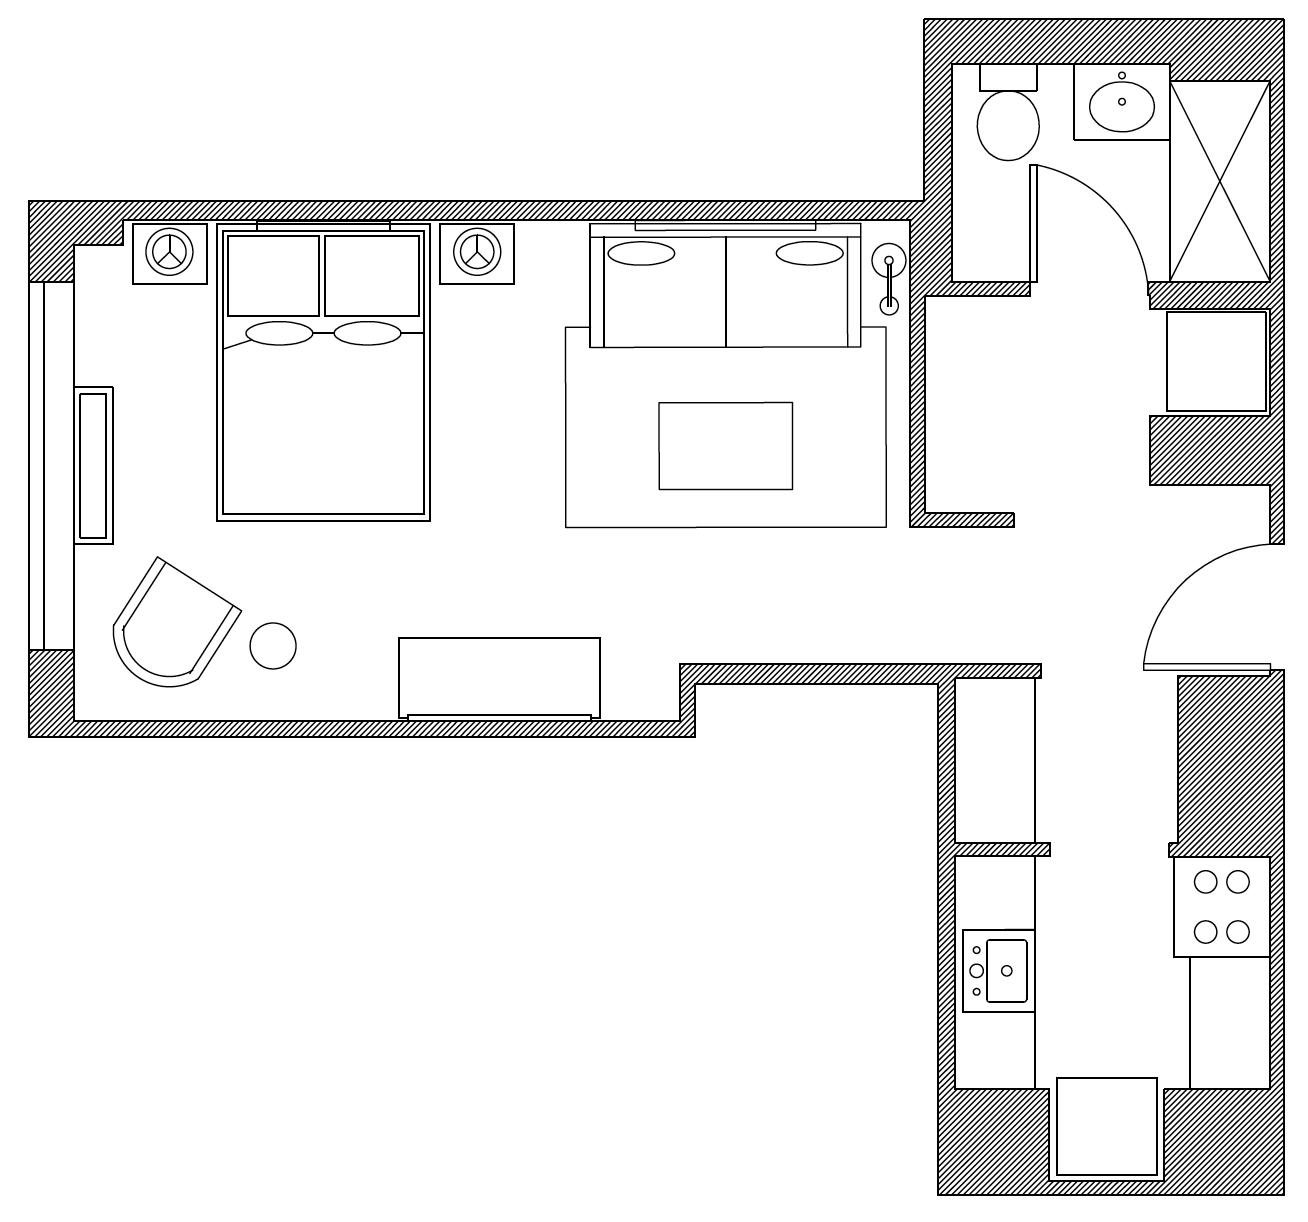 Floor plan at Apartment at Sierra, Manhattan, New York